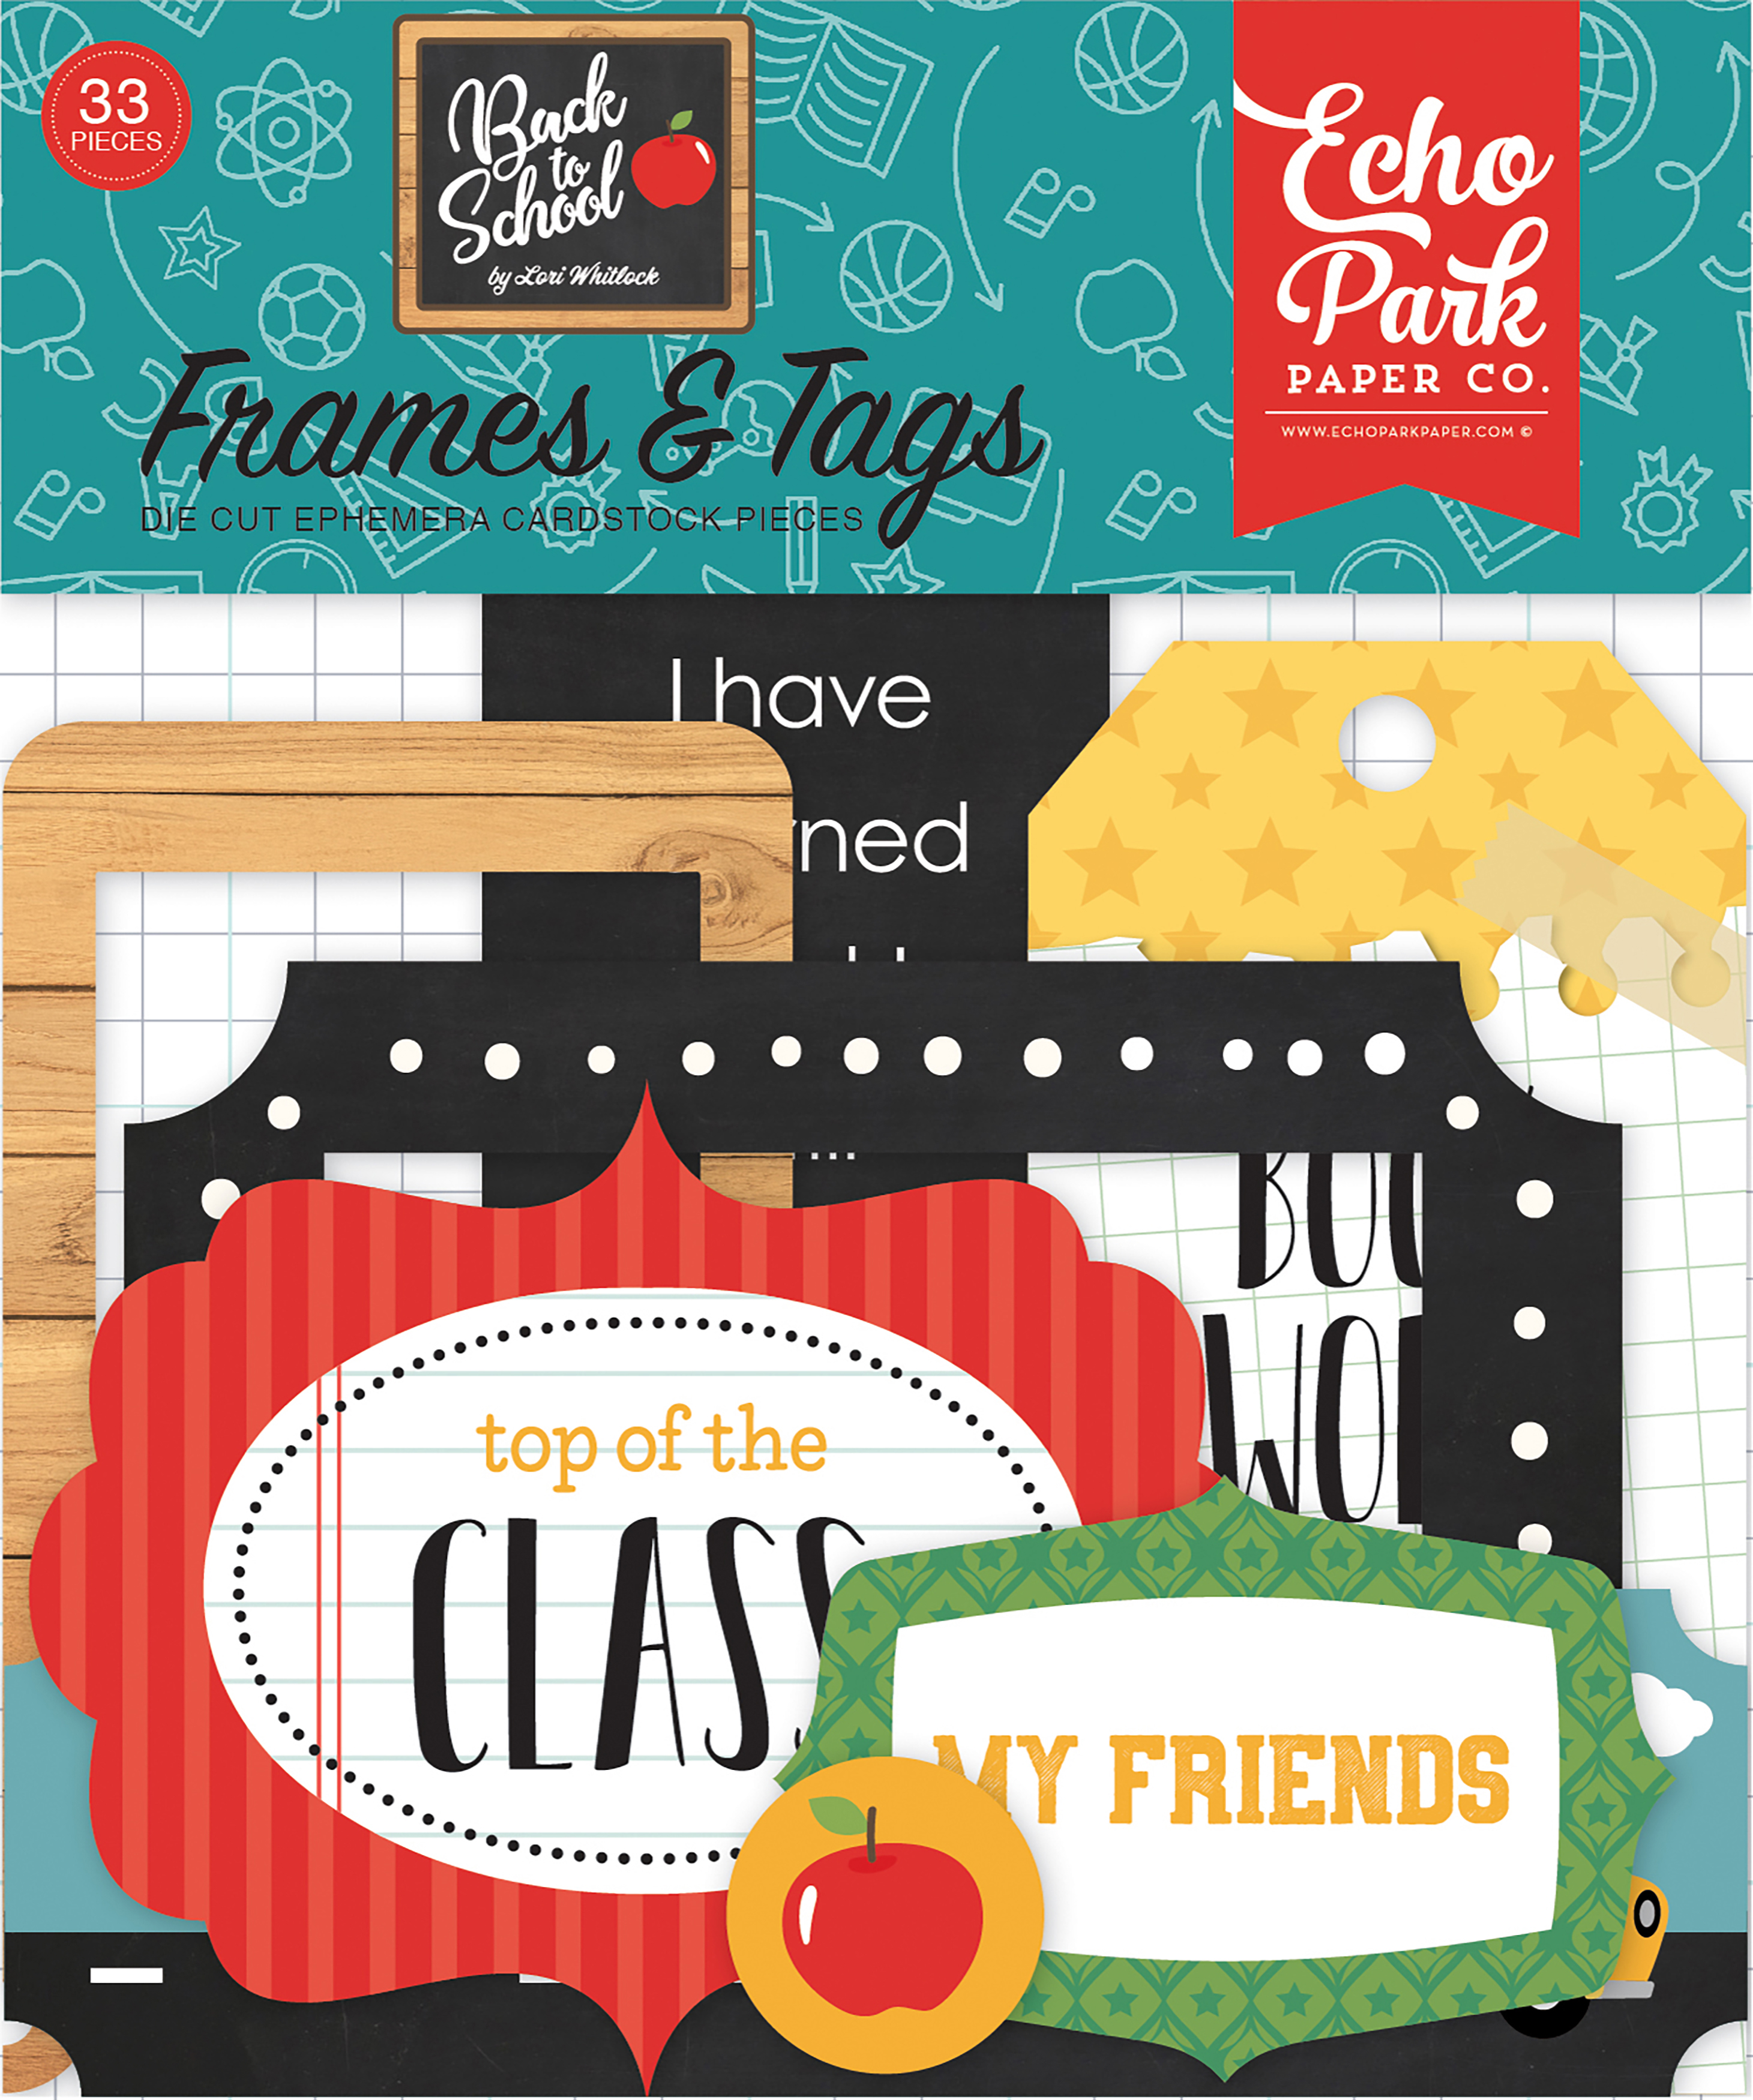 Back to School Frames & Tags Echo Park Cardstock Ephemera 33/Pkg-Frames & Tags